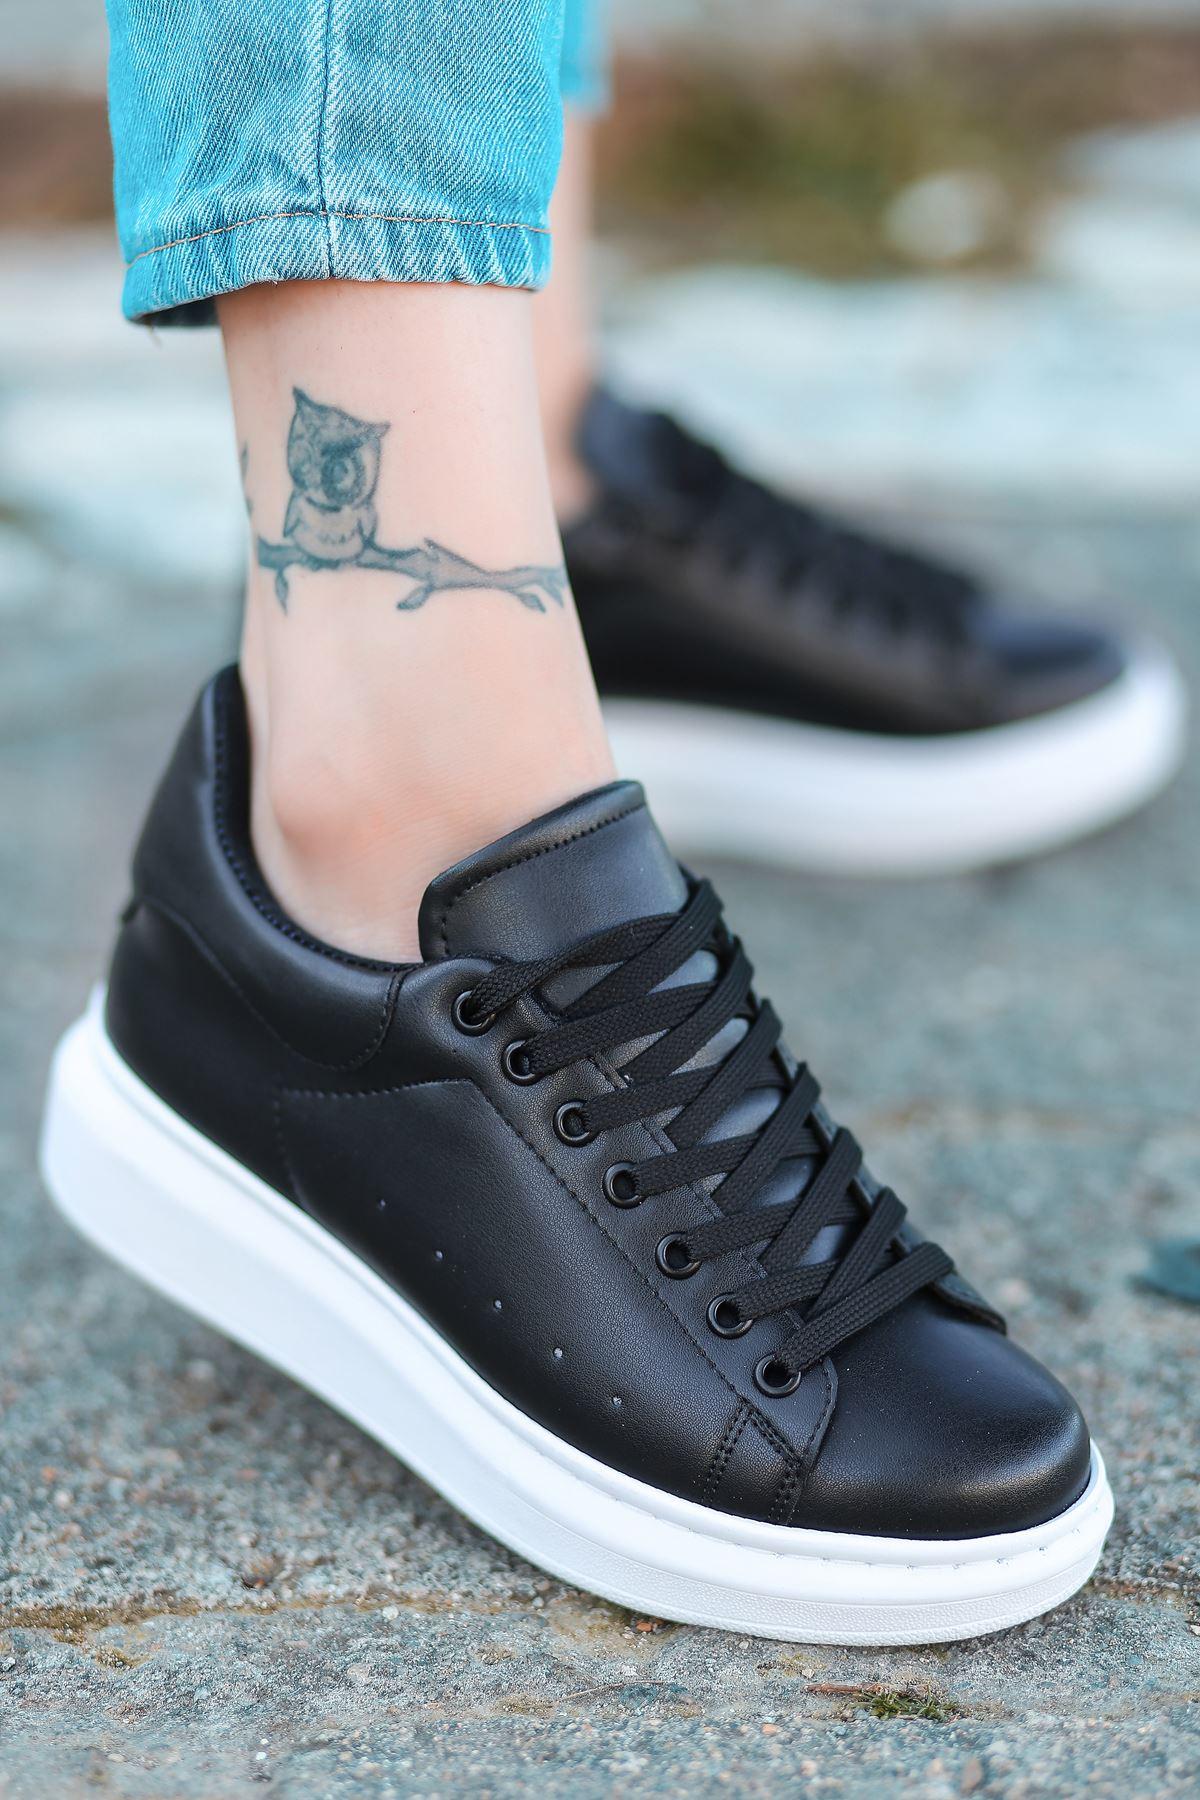 Lucy Mat Deri Bağcık Detay Sneakers Siyah